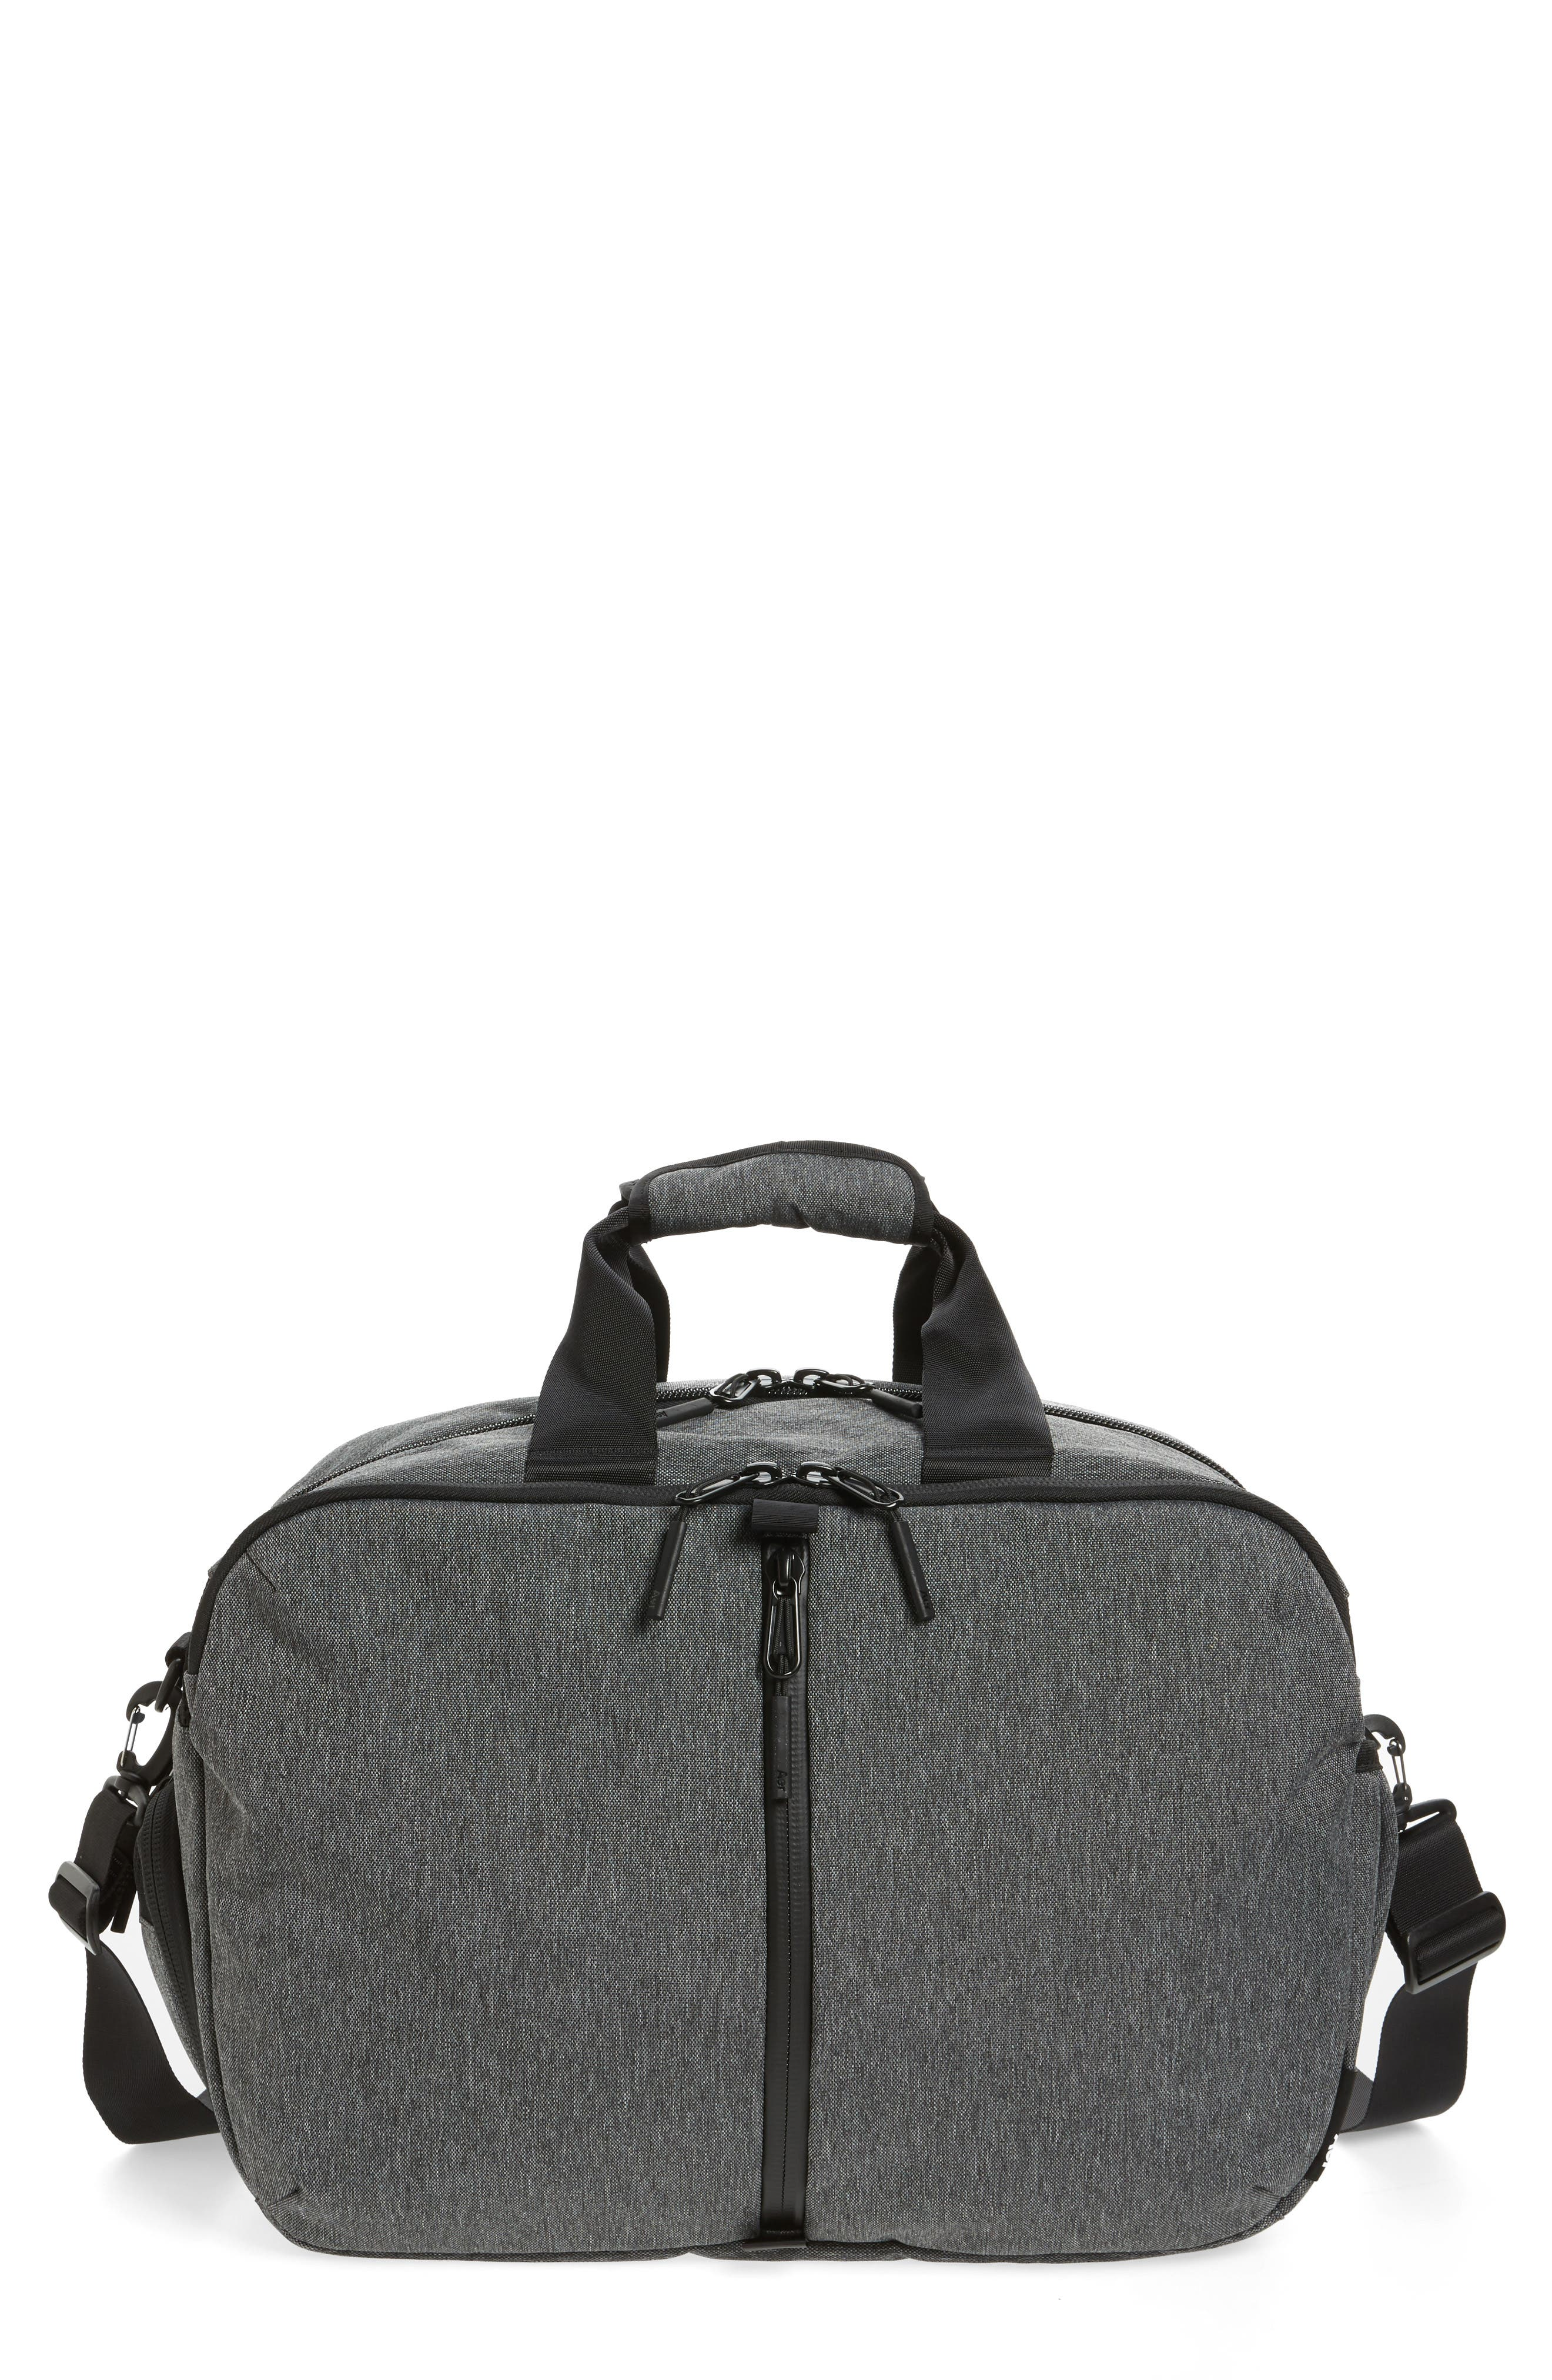 Main Image - Aer Gym Duffel 2 Bag